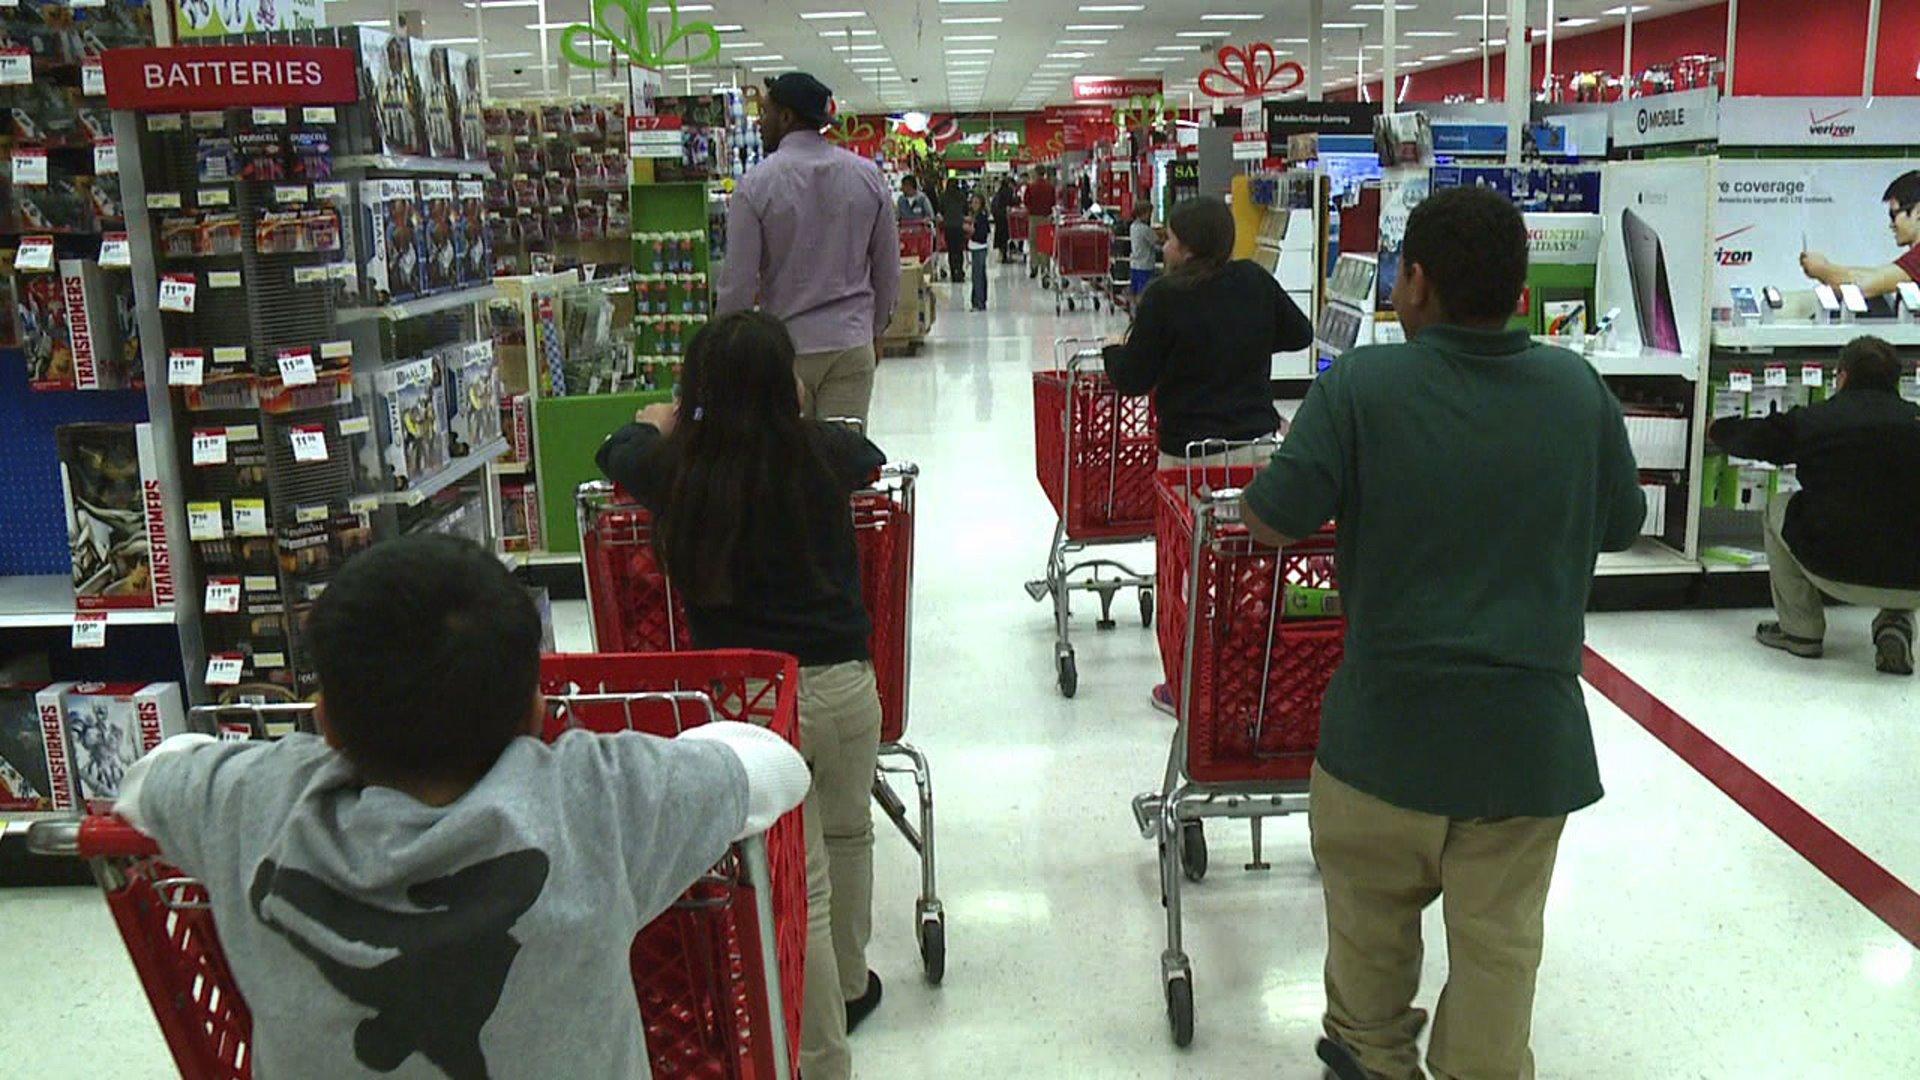 Broncos players like Julius Thomas take kids shopping for presents